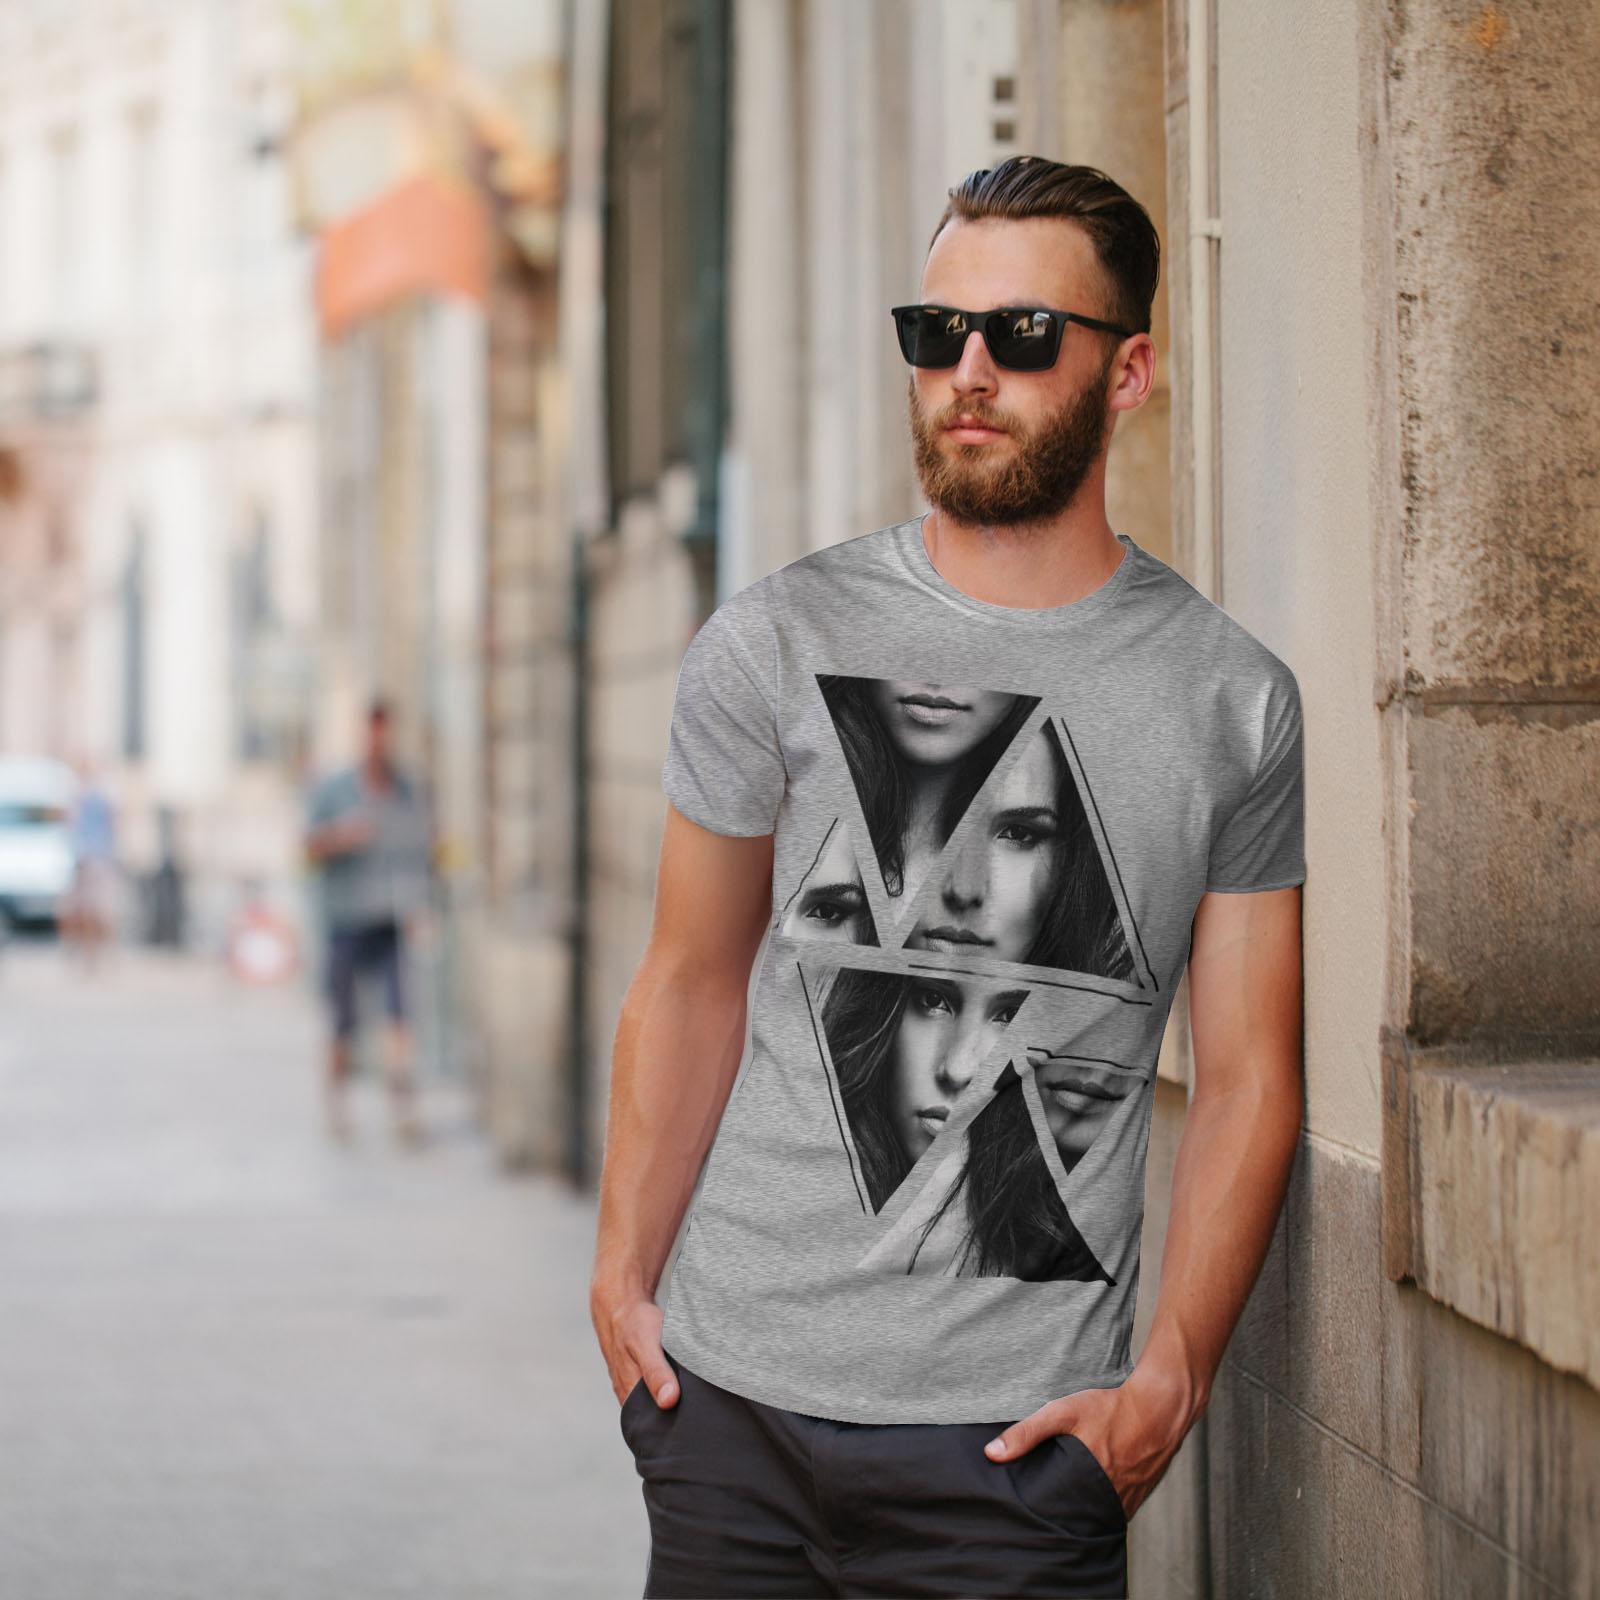 Wellcoda-Art-Fashion-Face-T-shirt-homme-Abstract-Design-graphique-imprime-Tee miniature 17